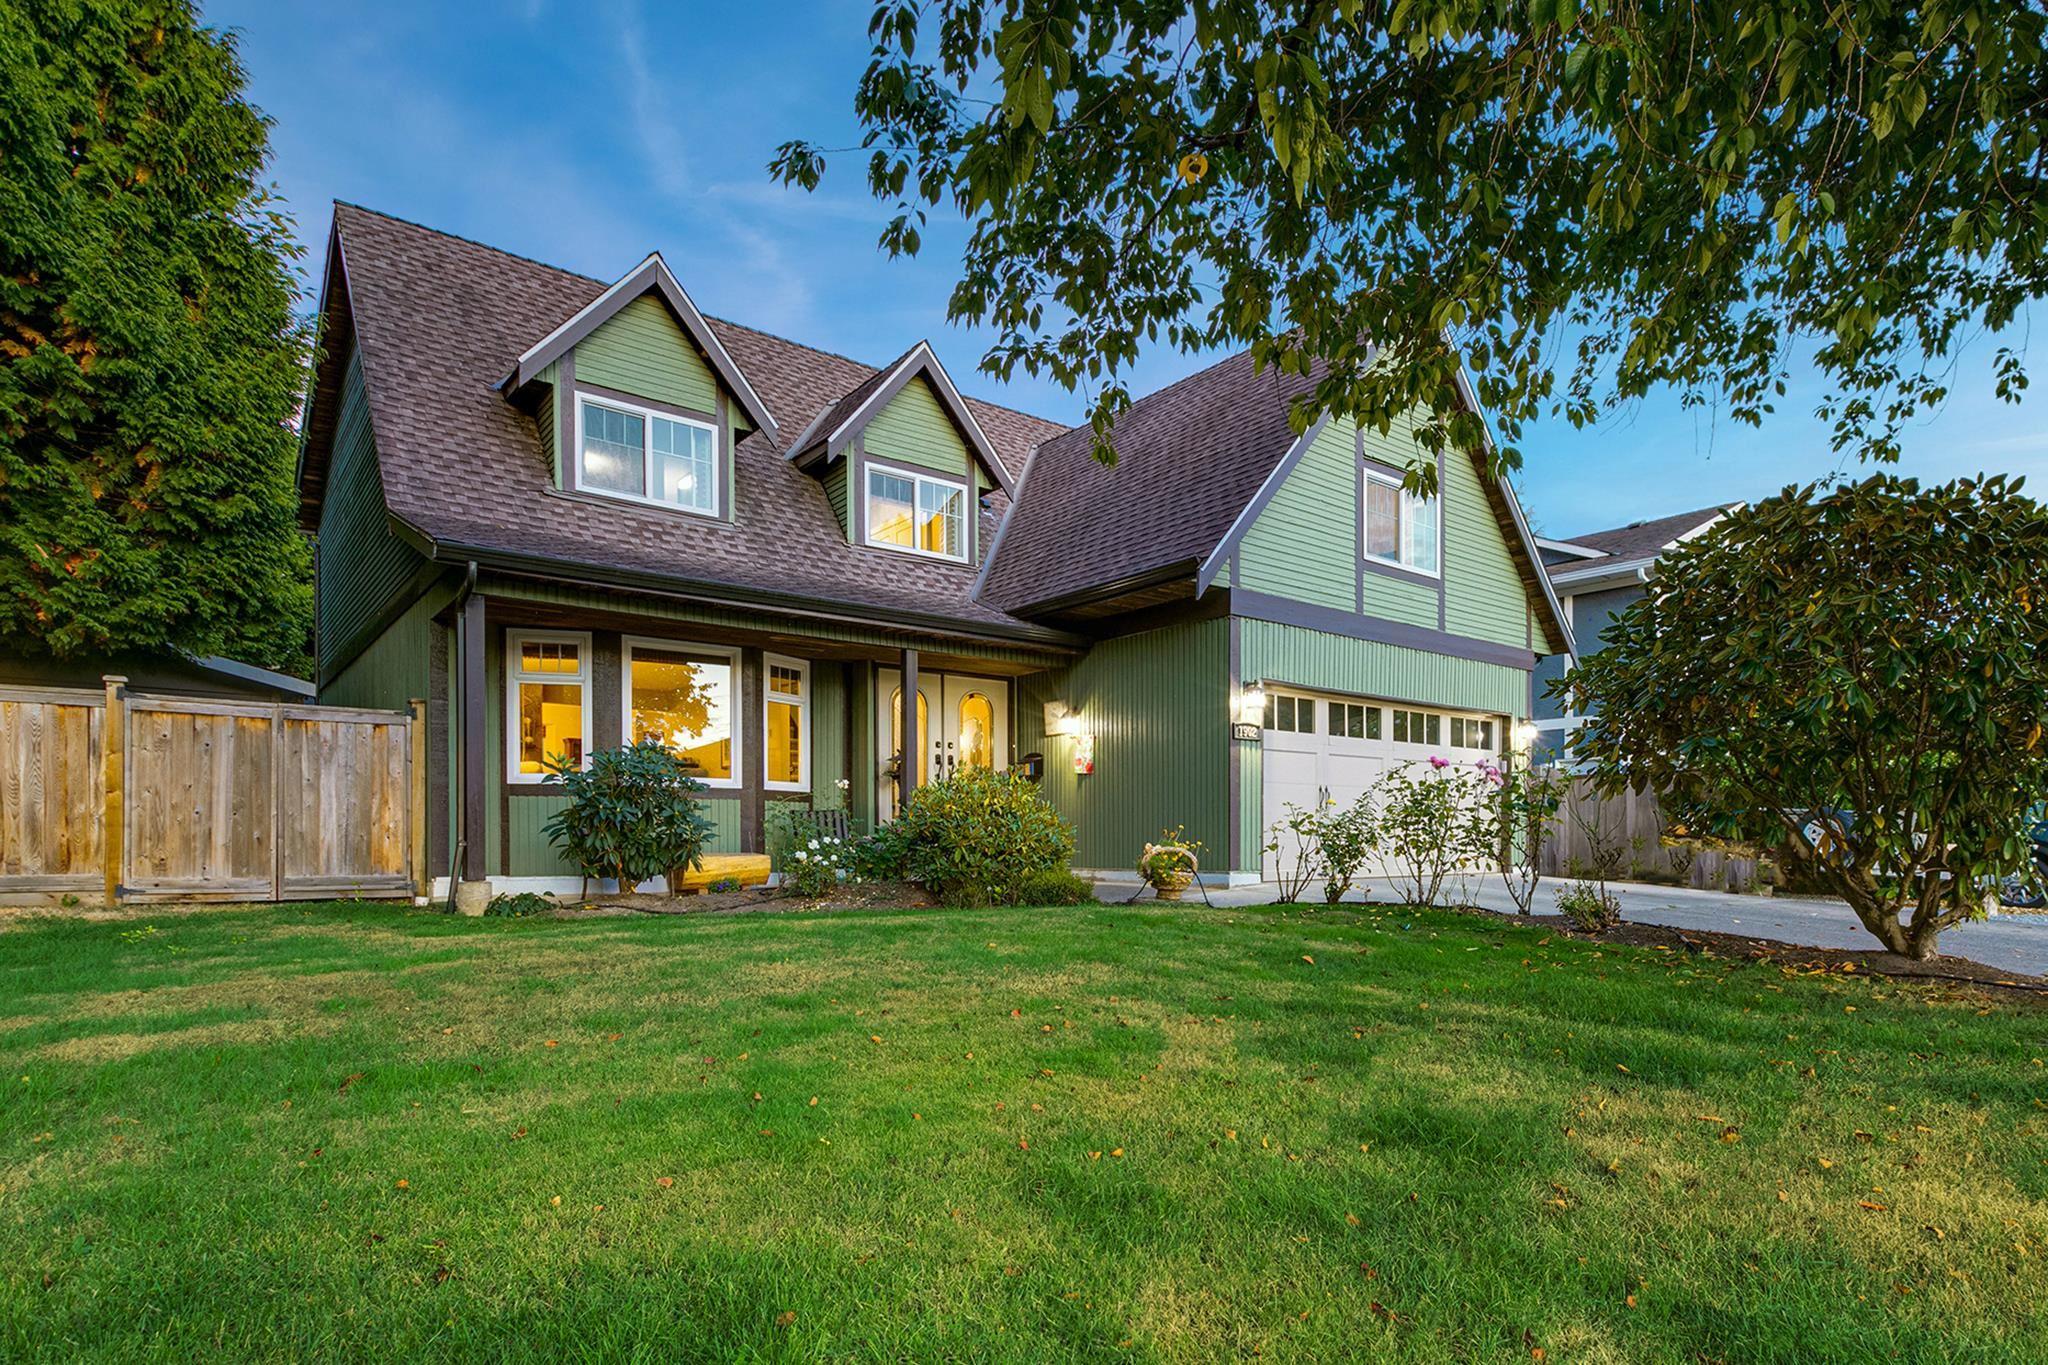 1902 144 STREET - Sunnyside Park Surrey House/Single Family for sale, 3 Bedrooms (R2618938) - #1